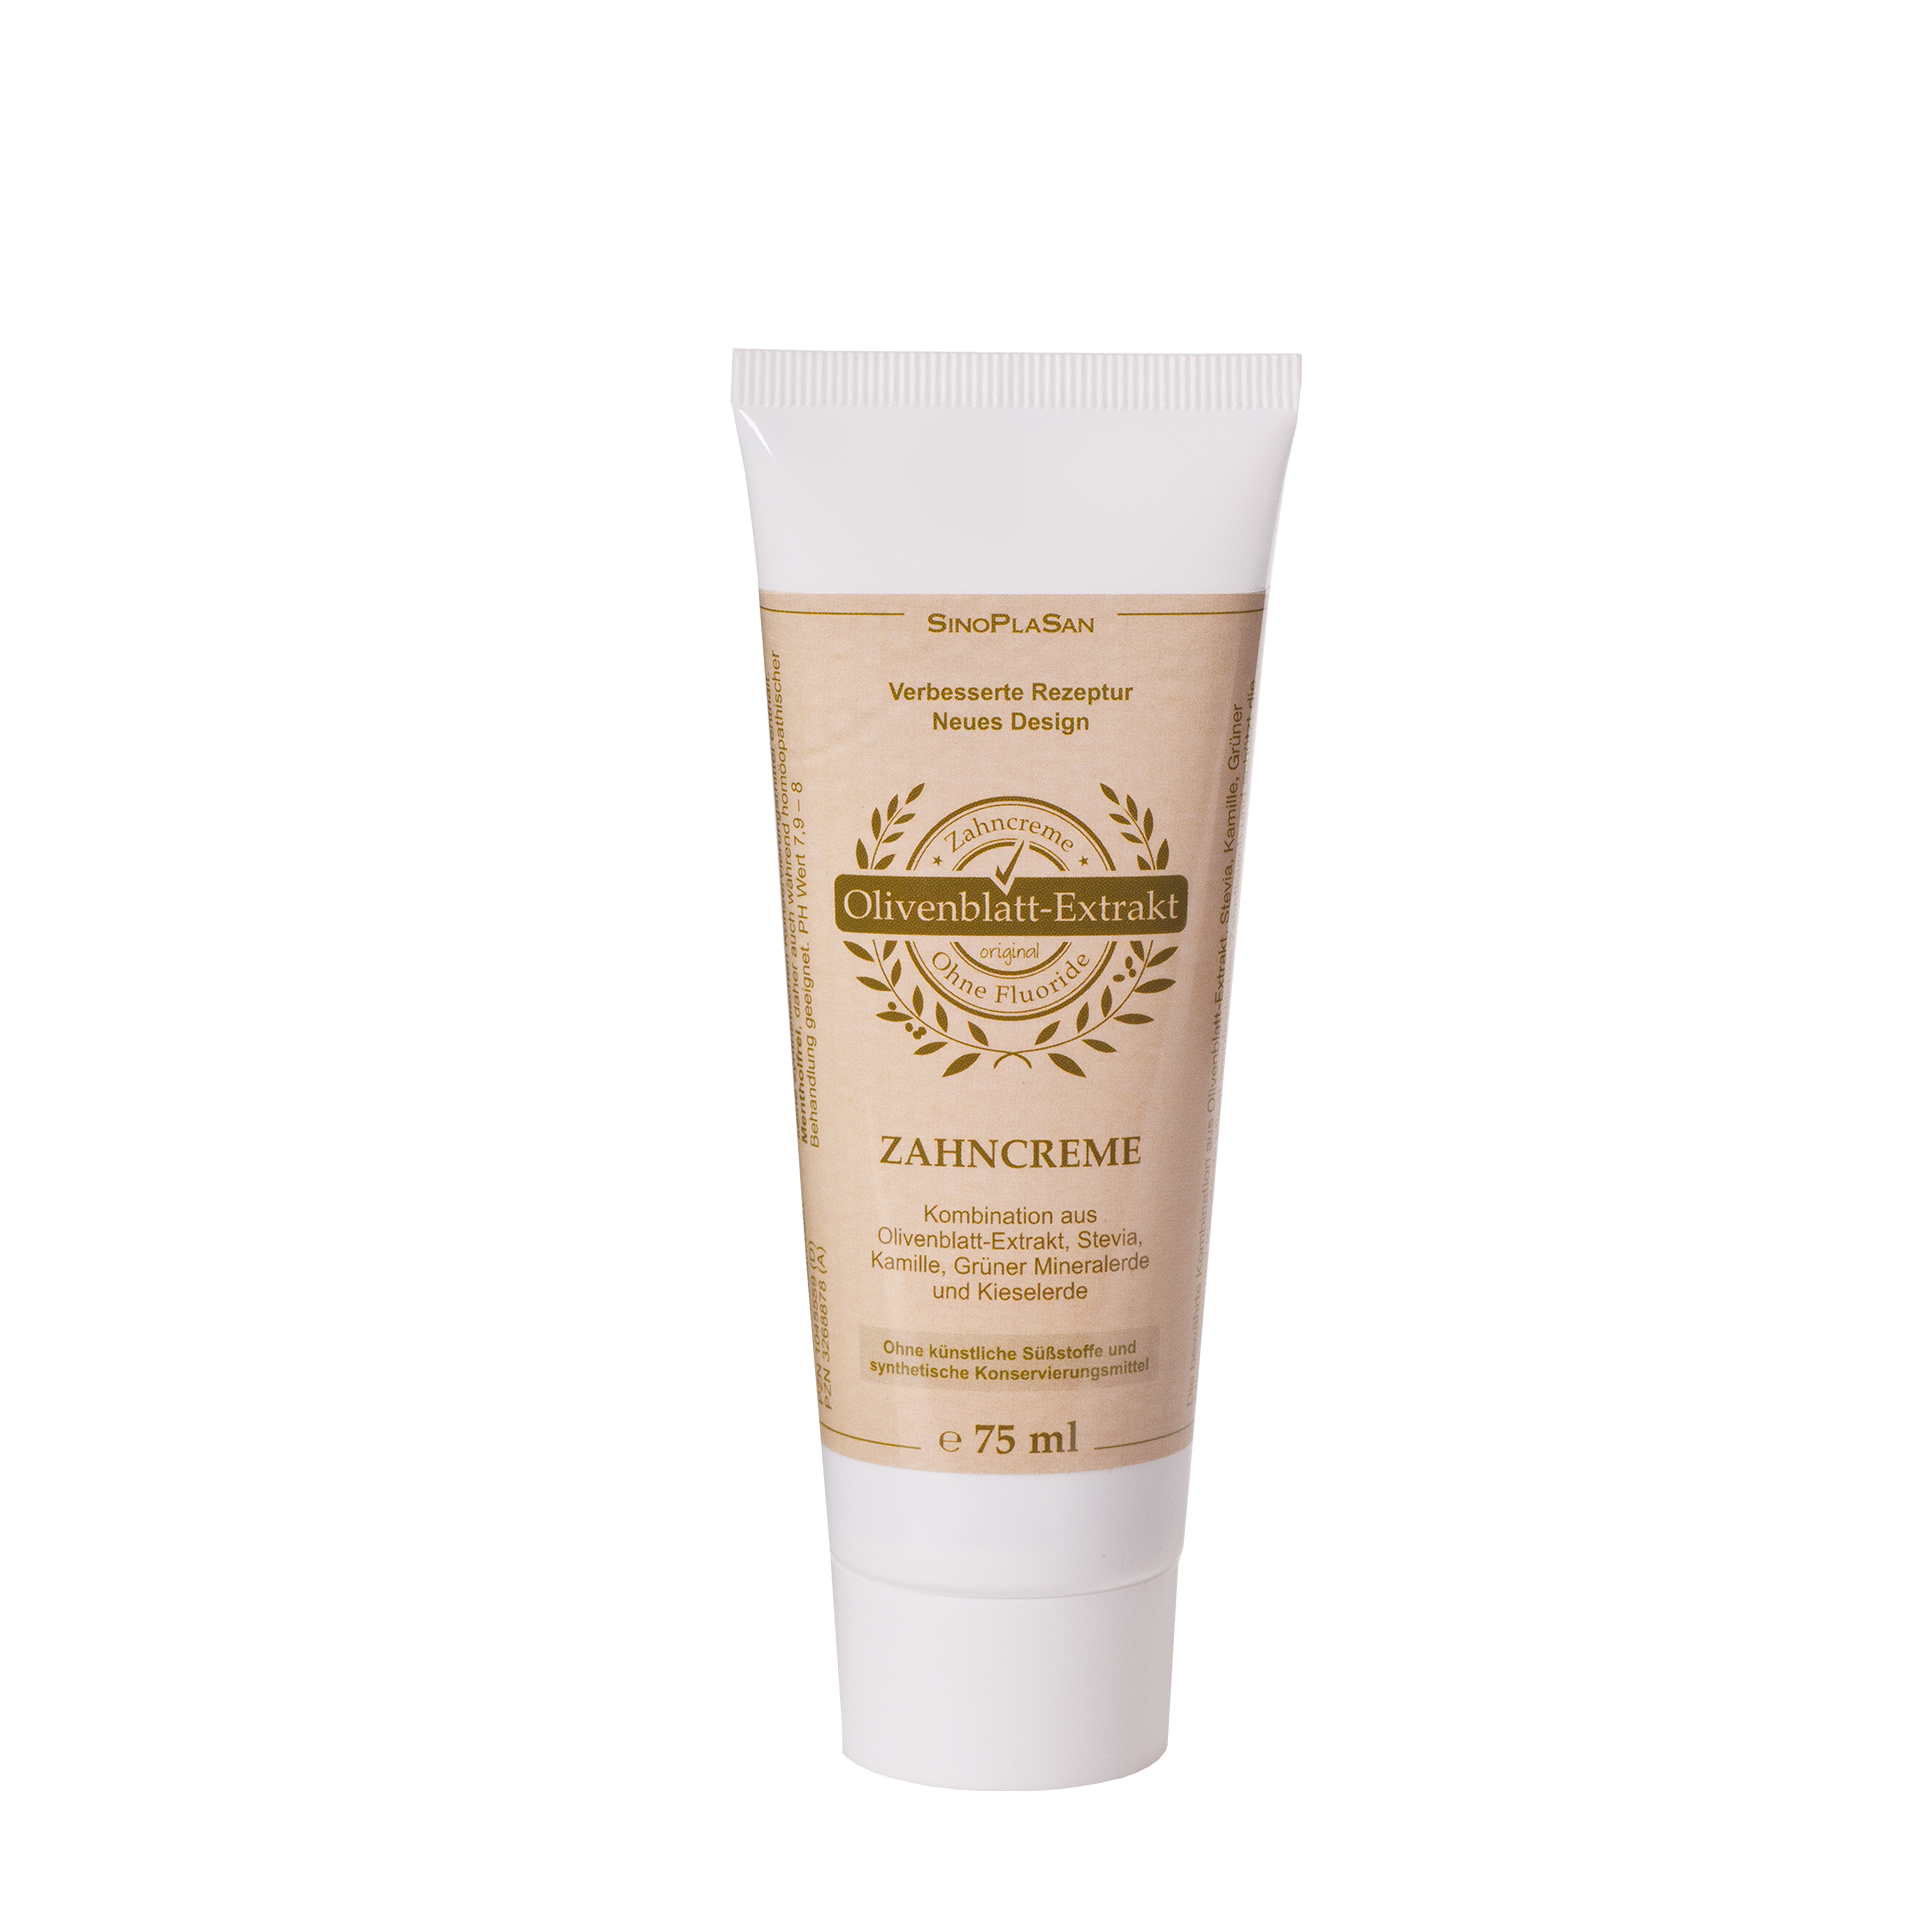 Olivenblatt-Extrakt Zahncreme, 75 ml